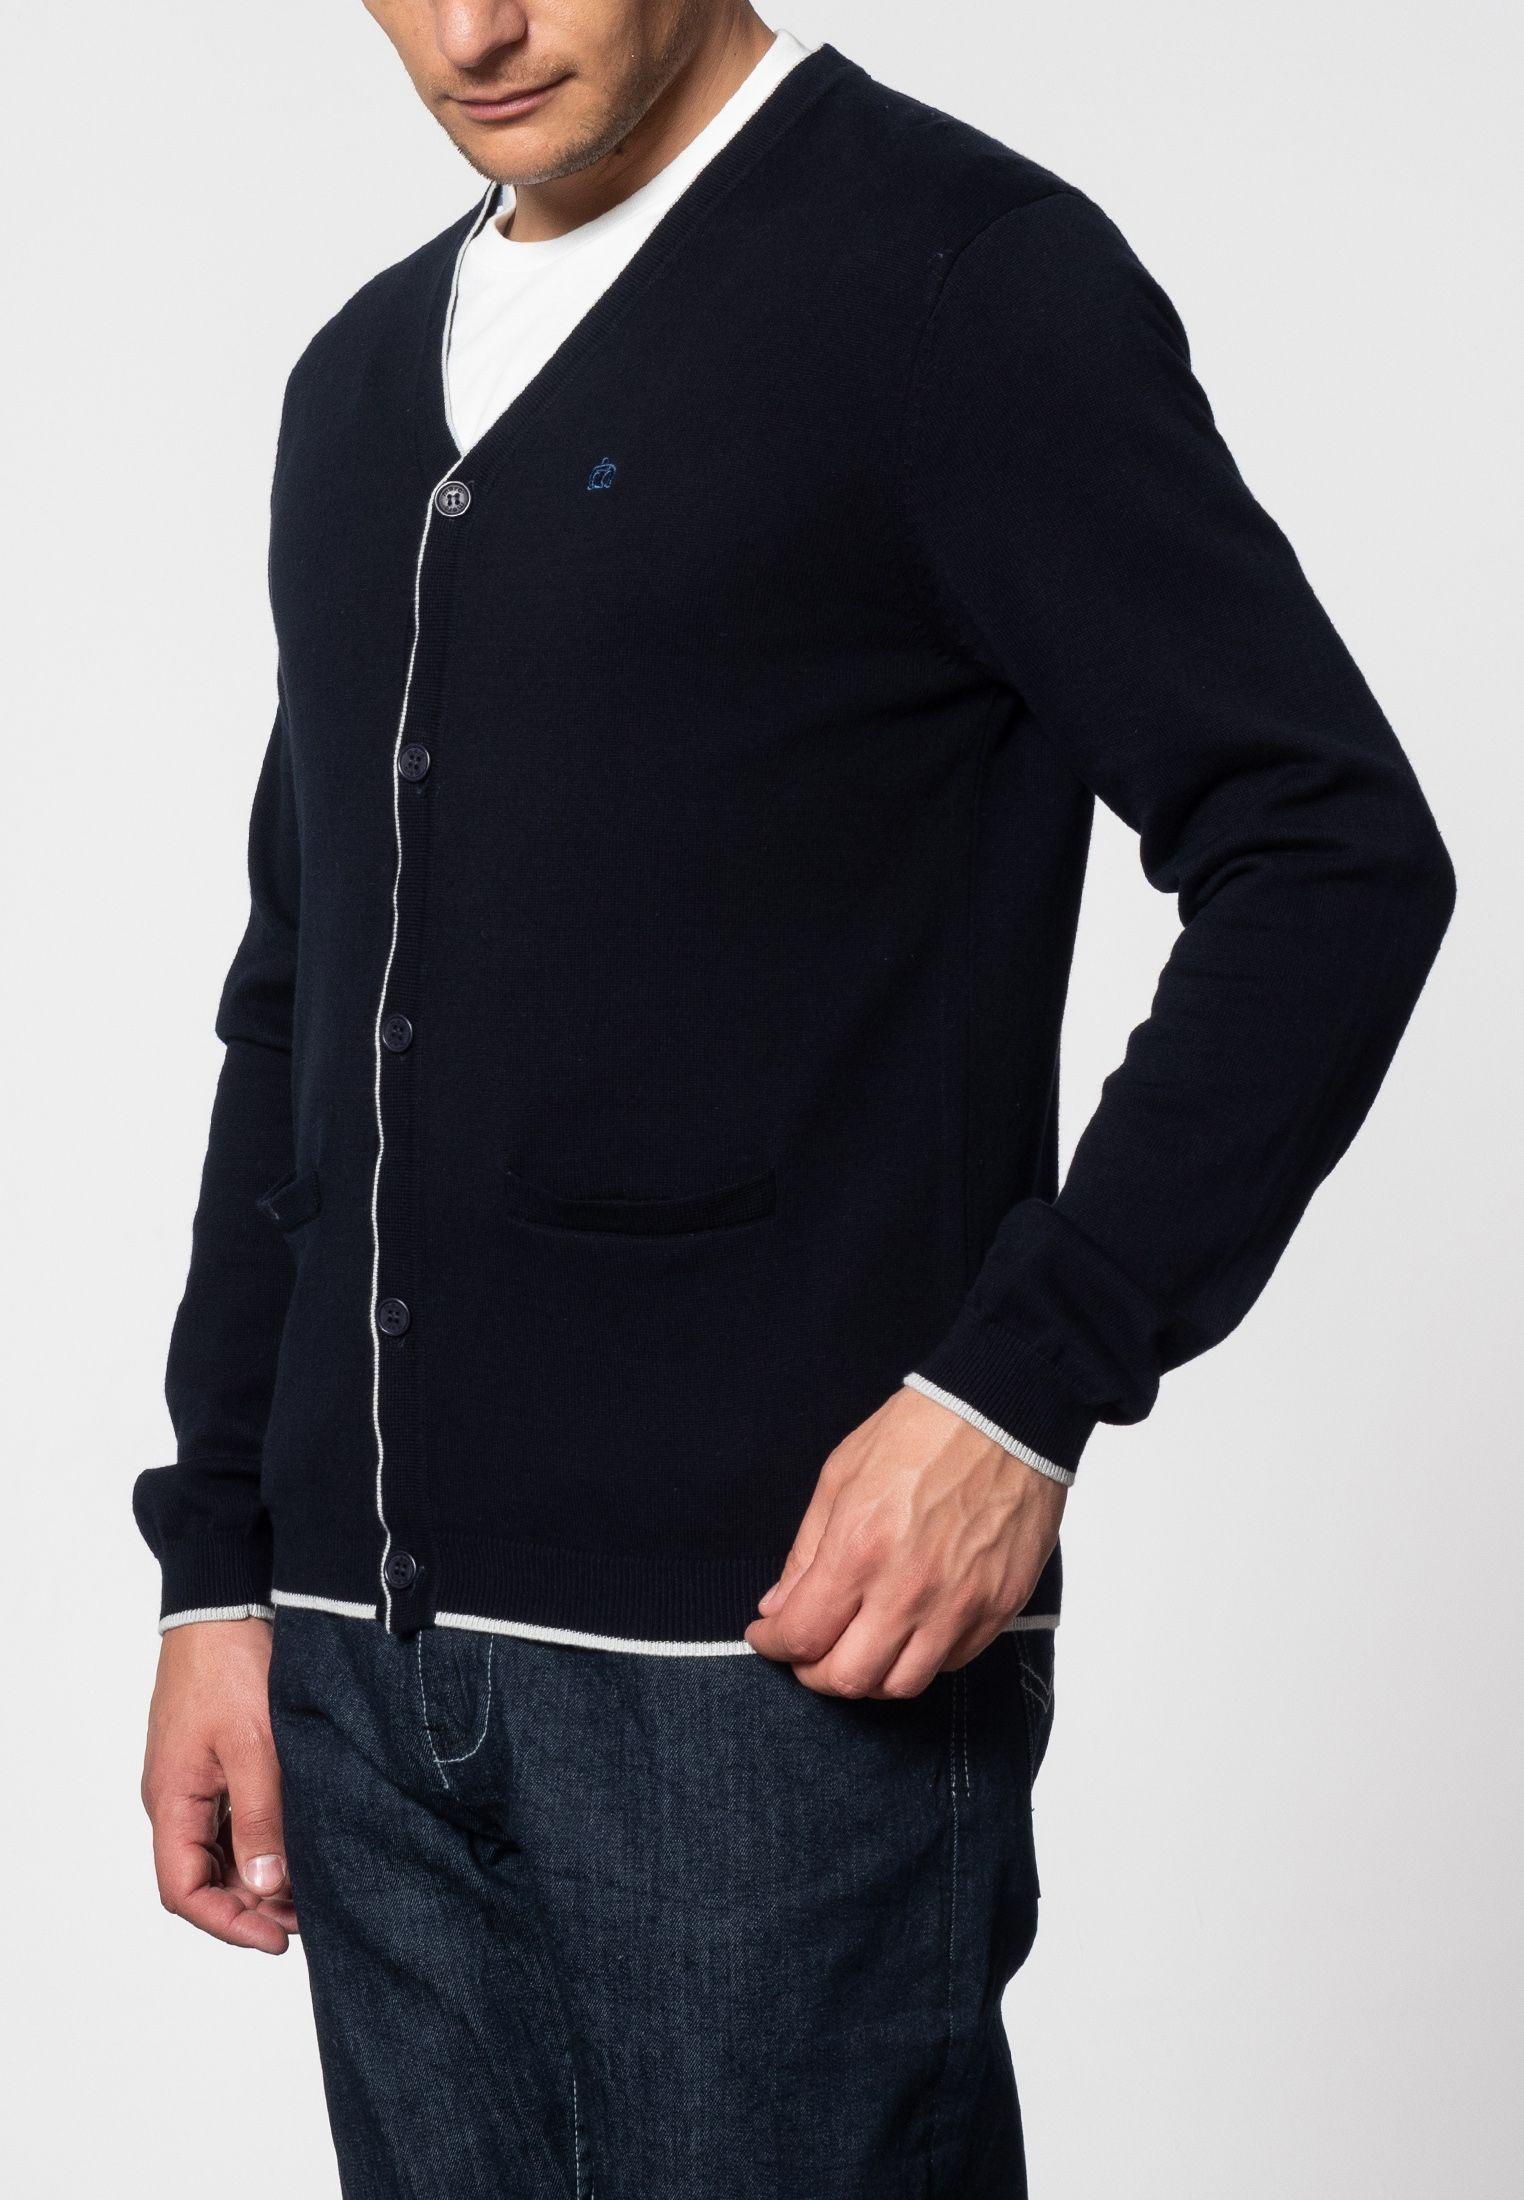 Ryan V-Neck Tipped Cardigan In Dark Navy